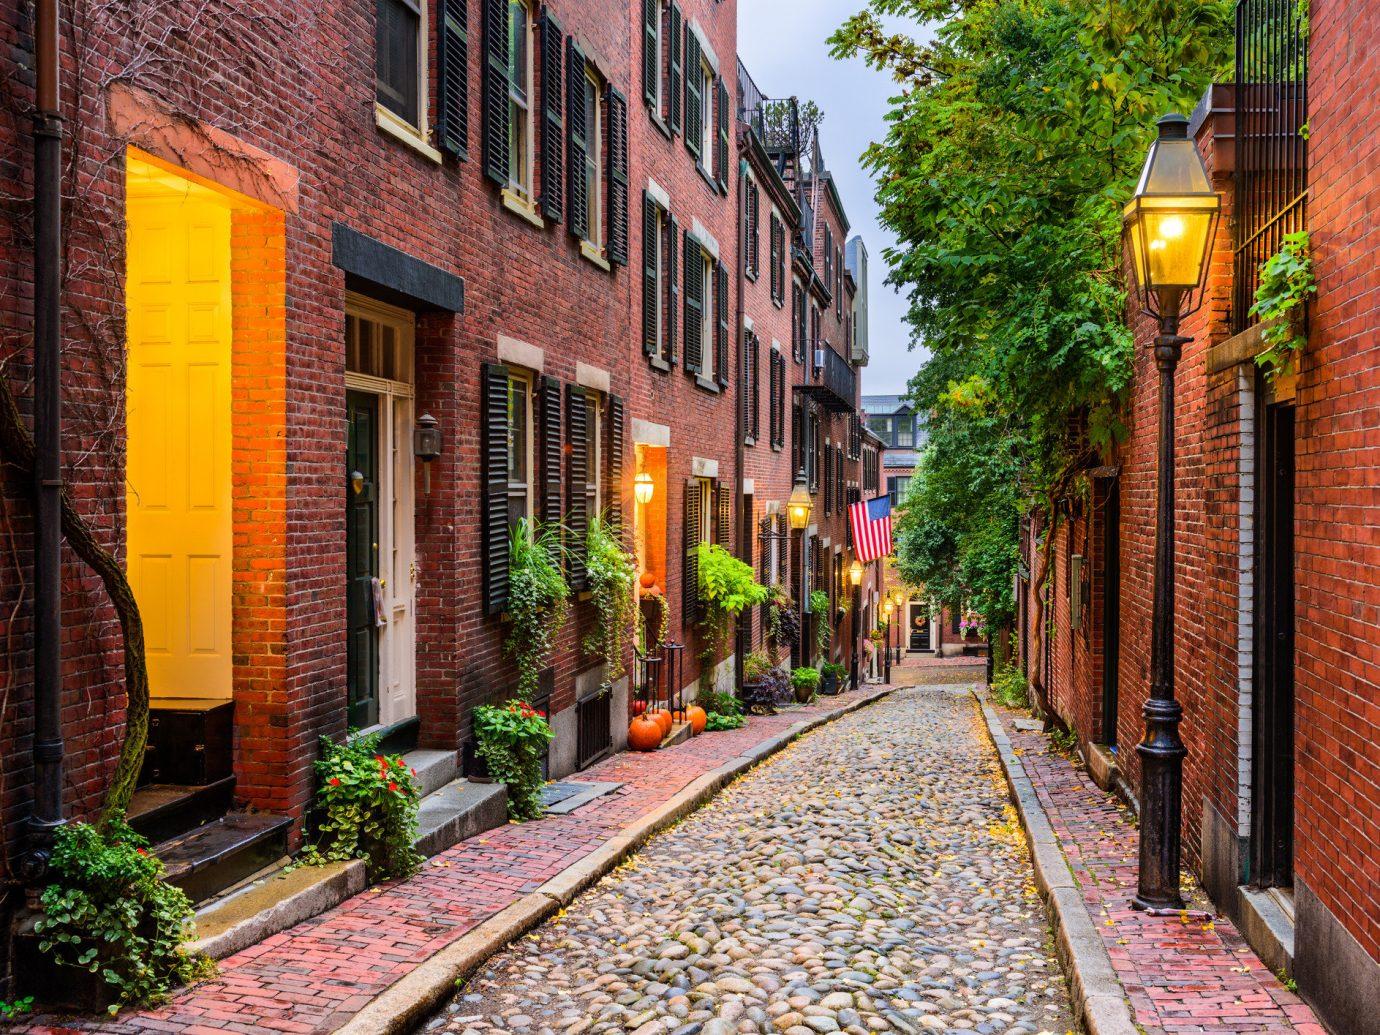 Narrow street in downtown boston